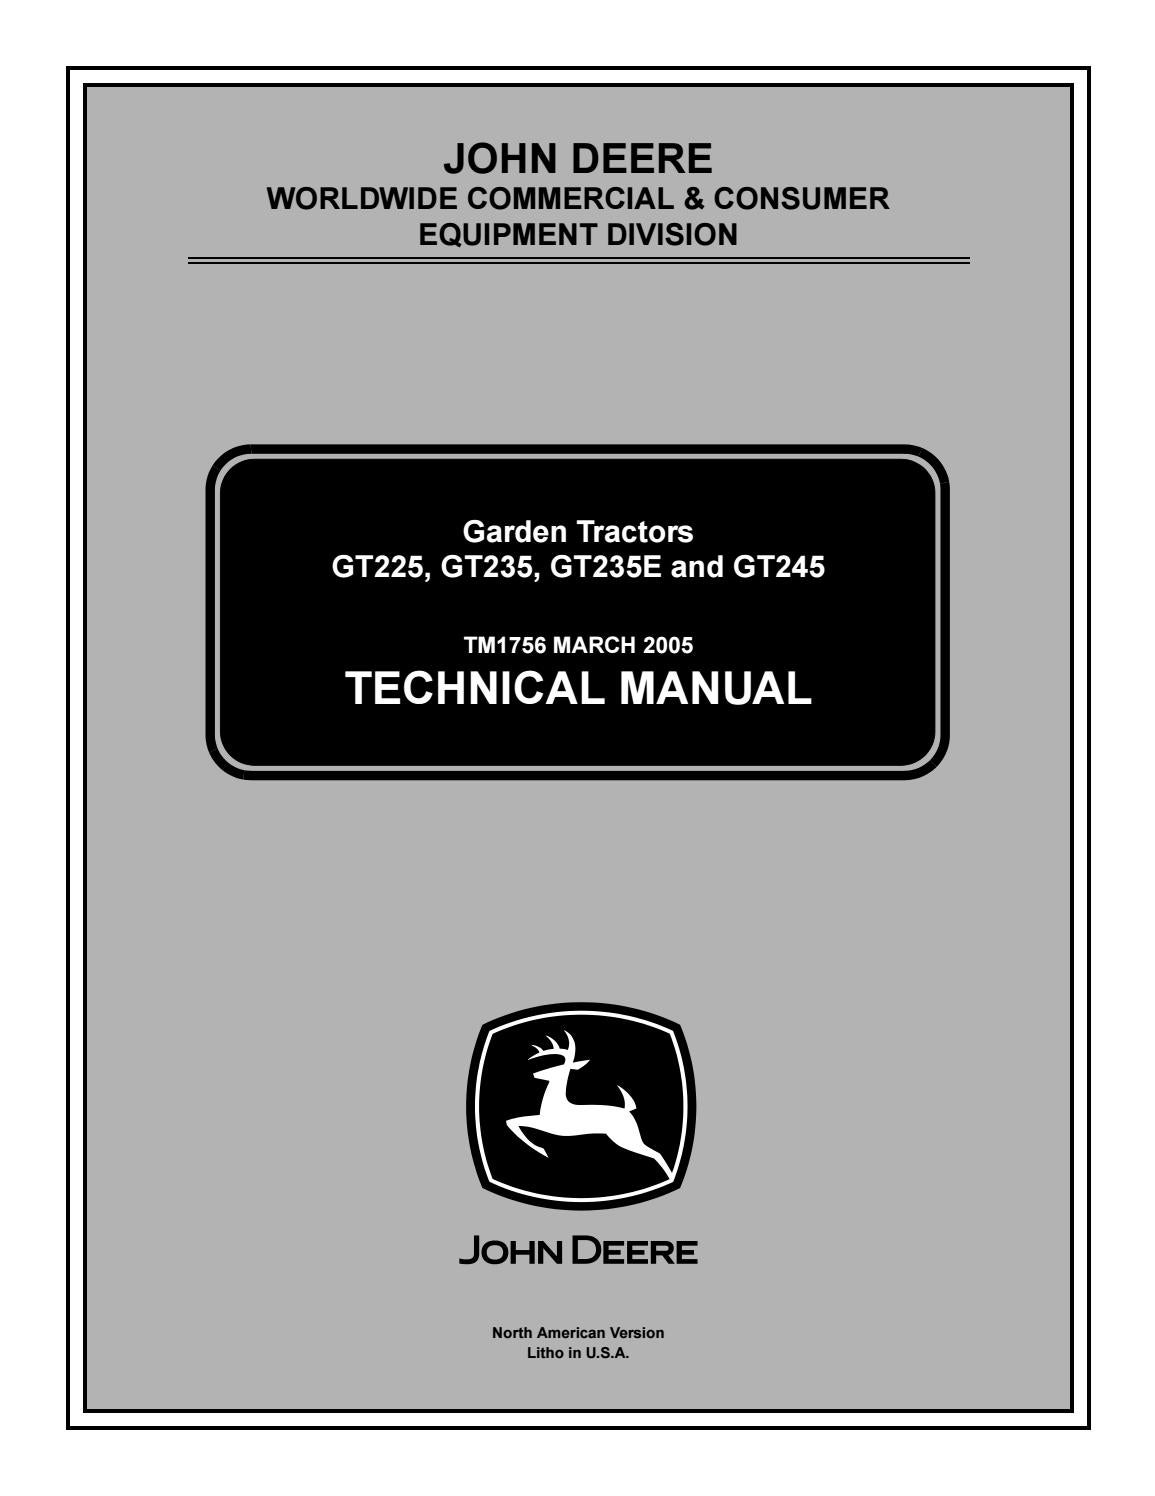 John deere gt235 lawn garden tractor service repair manual